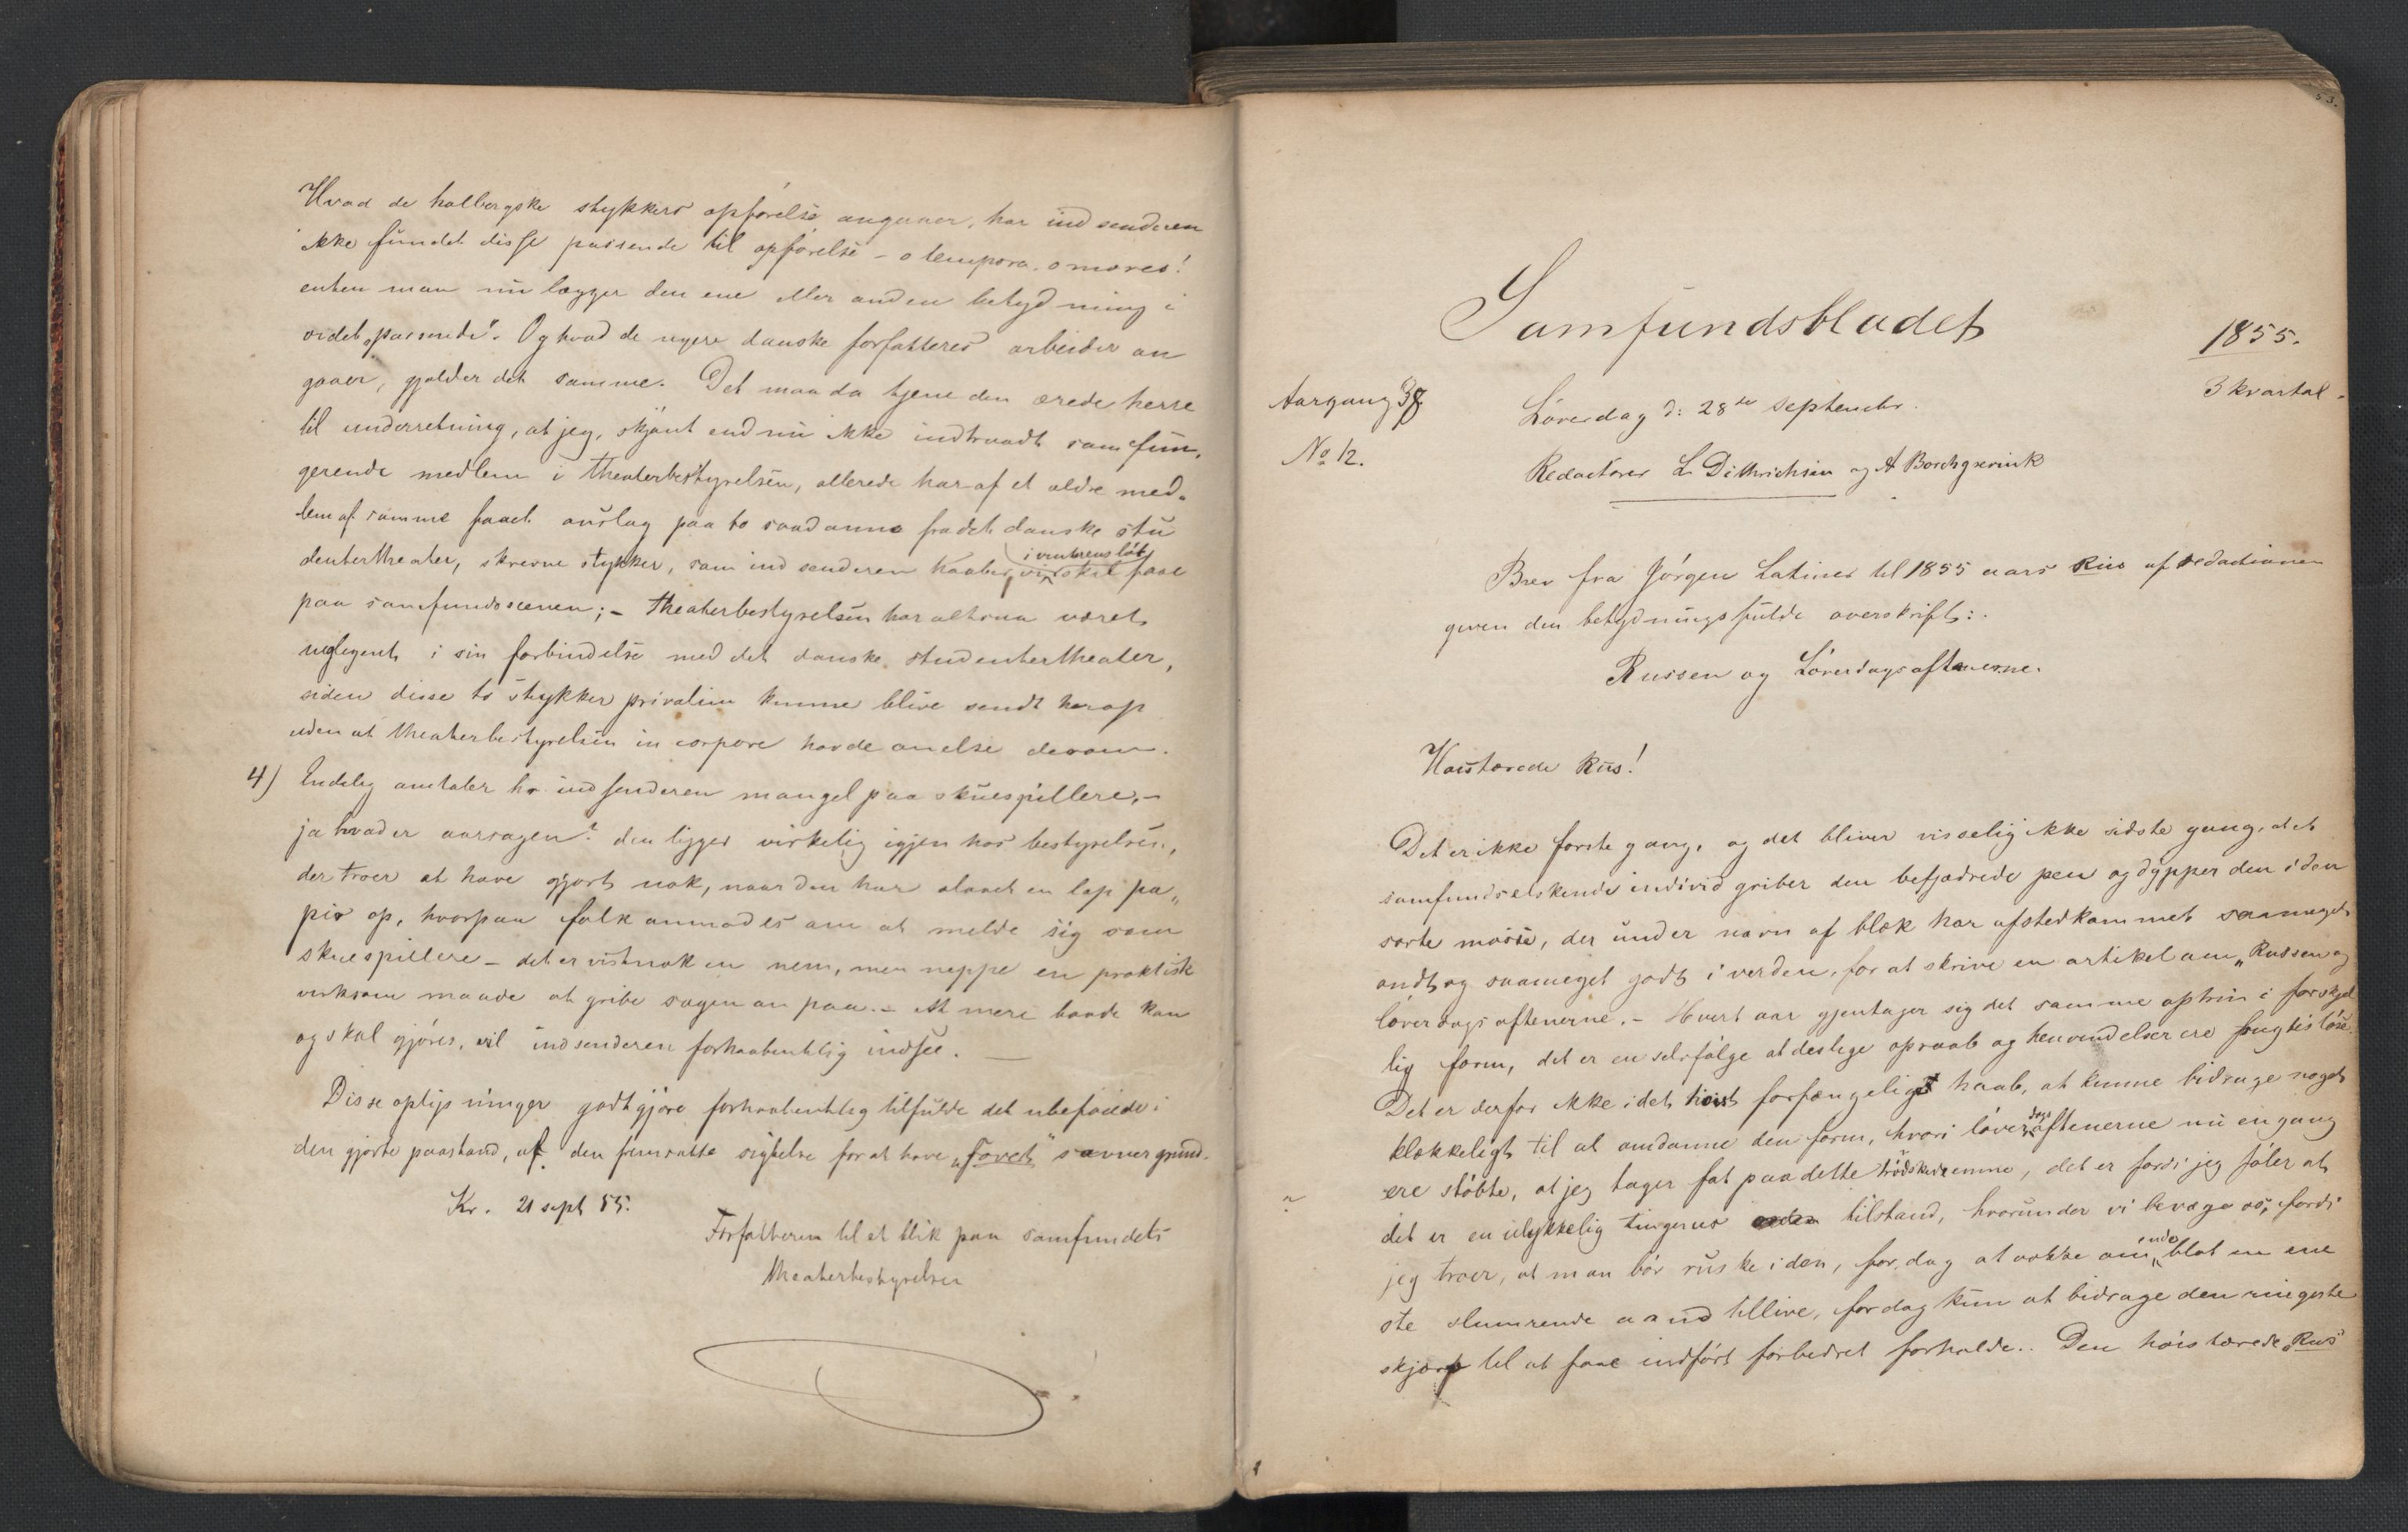 RA, Det Norske Studentersamfund, X/Xa/L0005, 1855-1856, s. 28